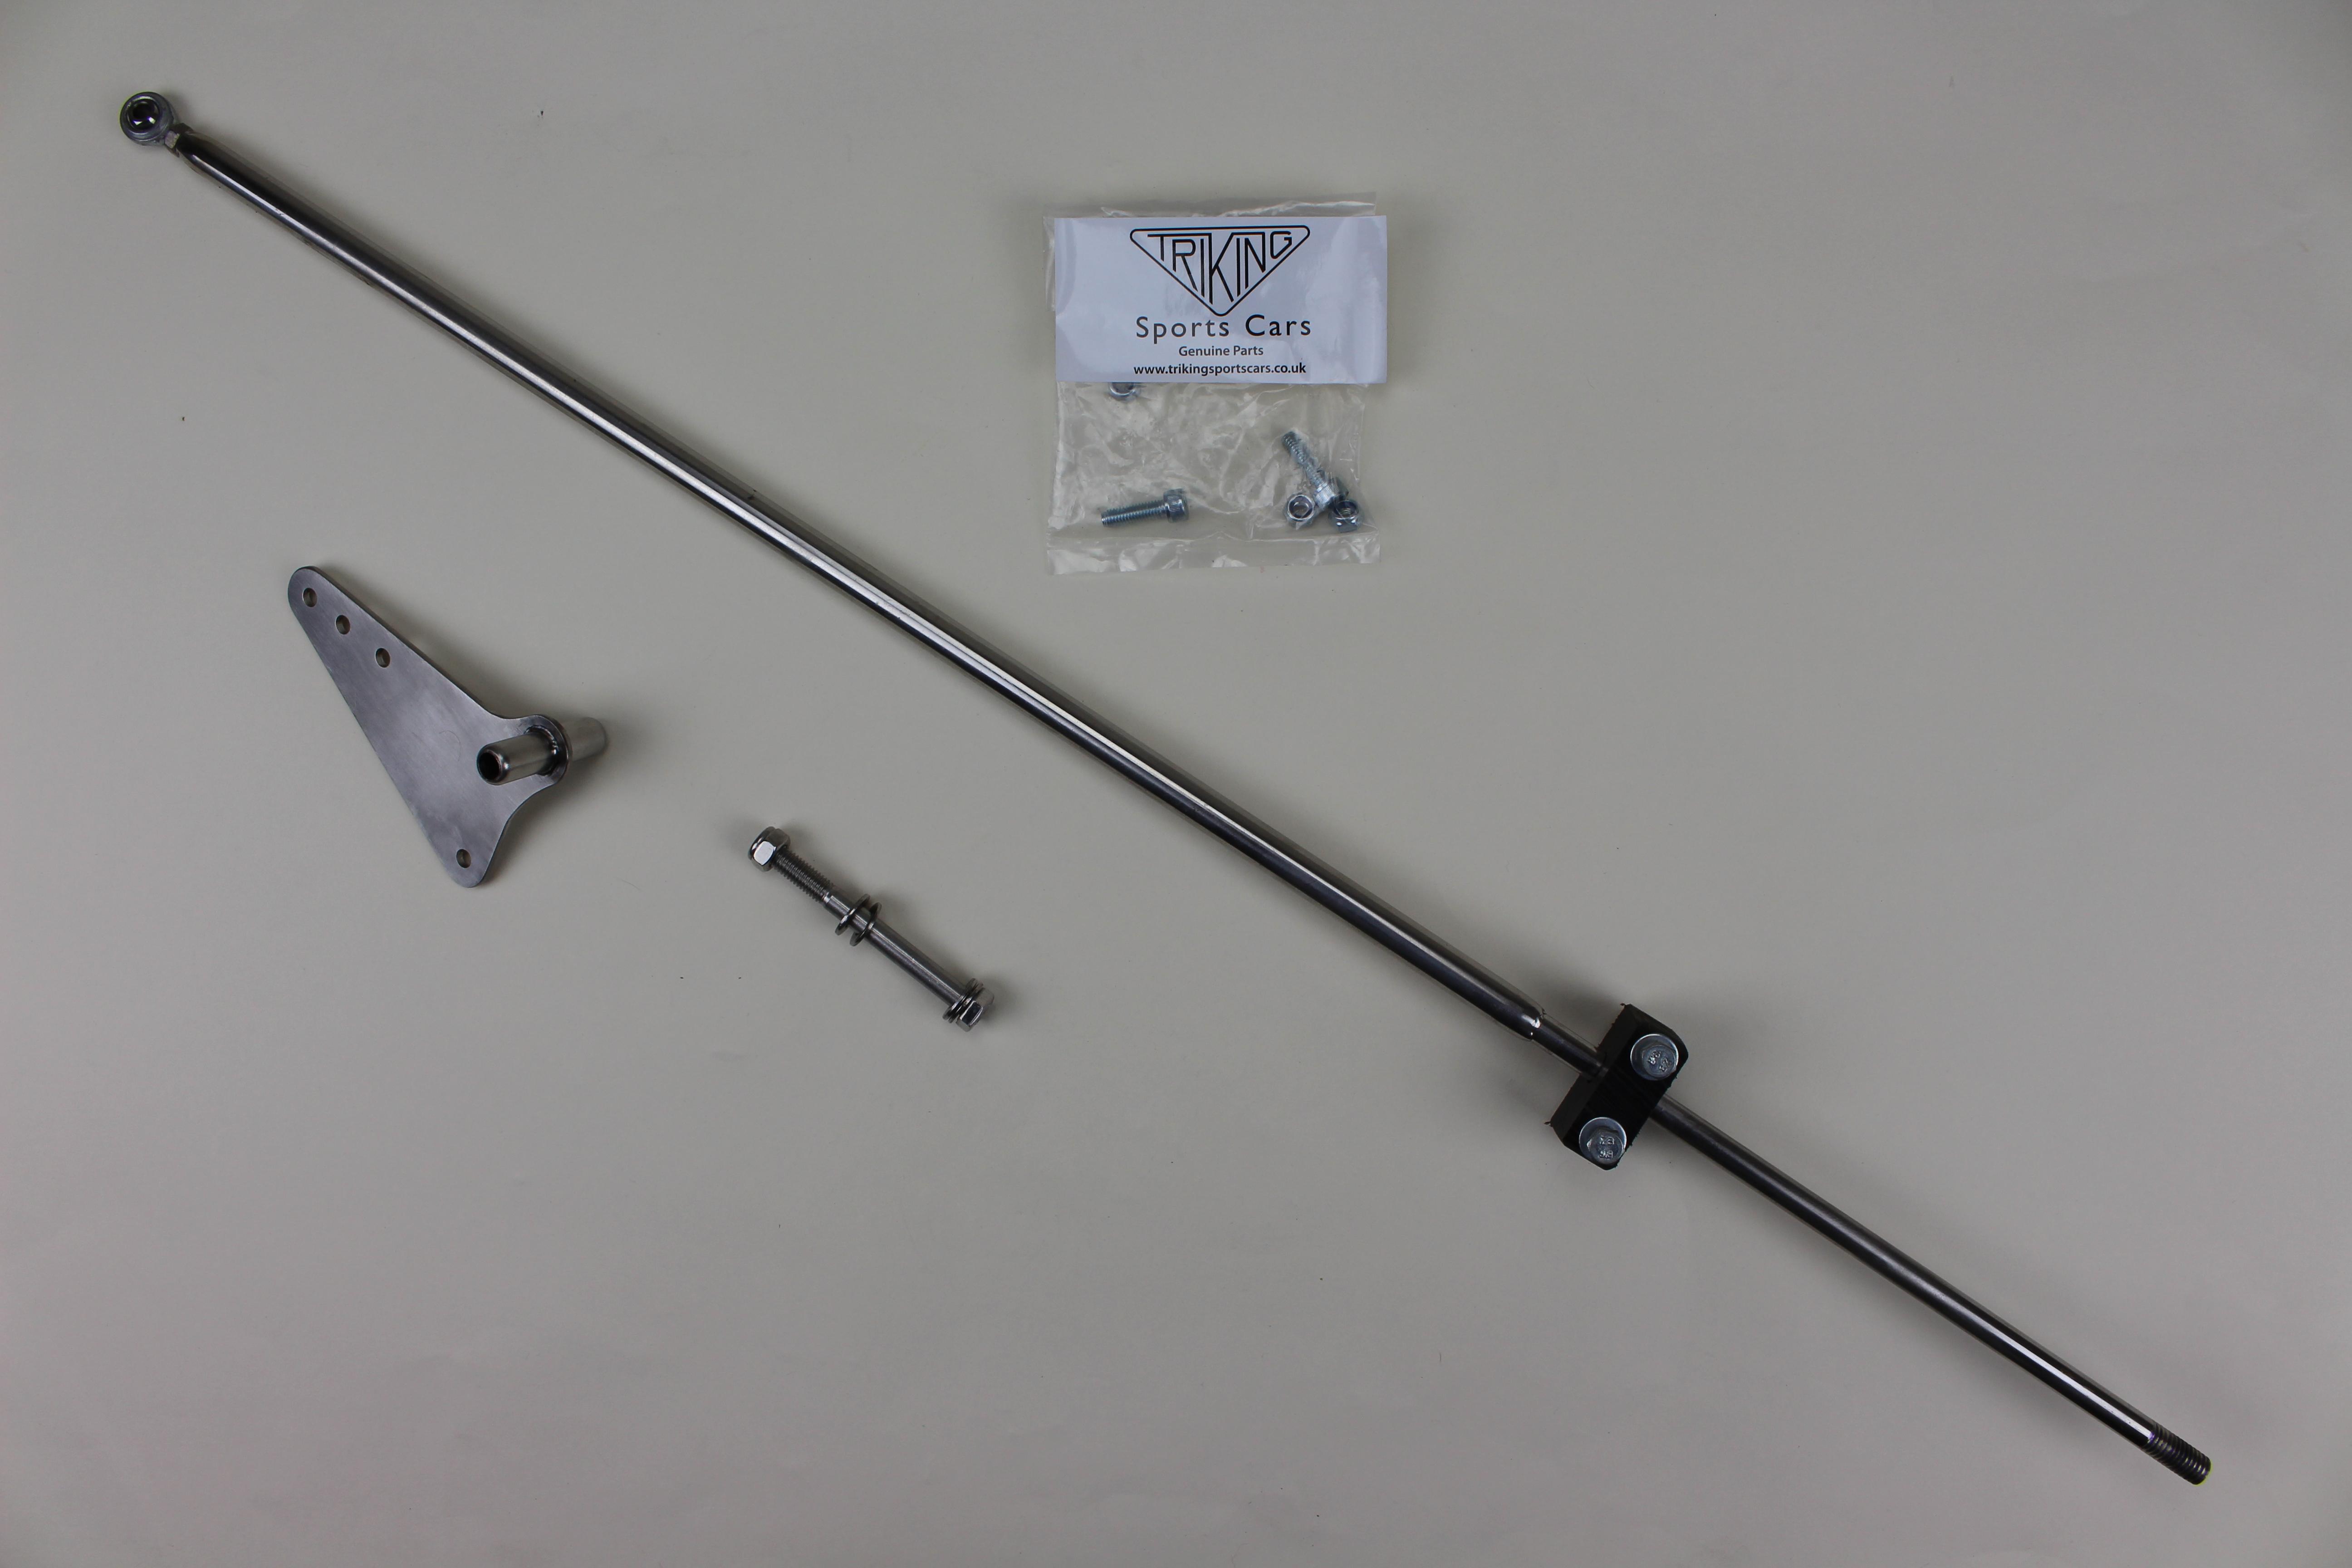 Rotating Push Pull Linkage : Gear linkage push pull type « triking shop